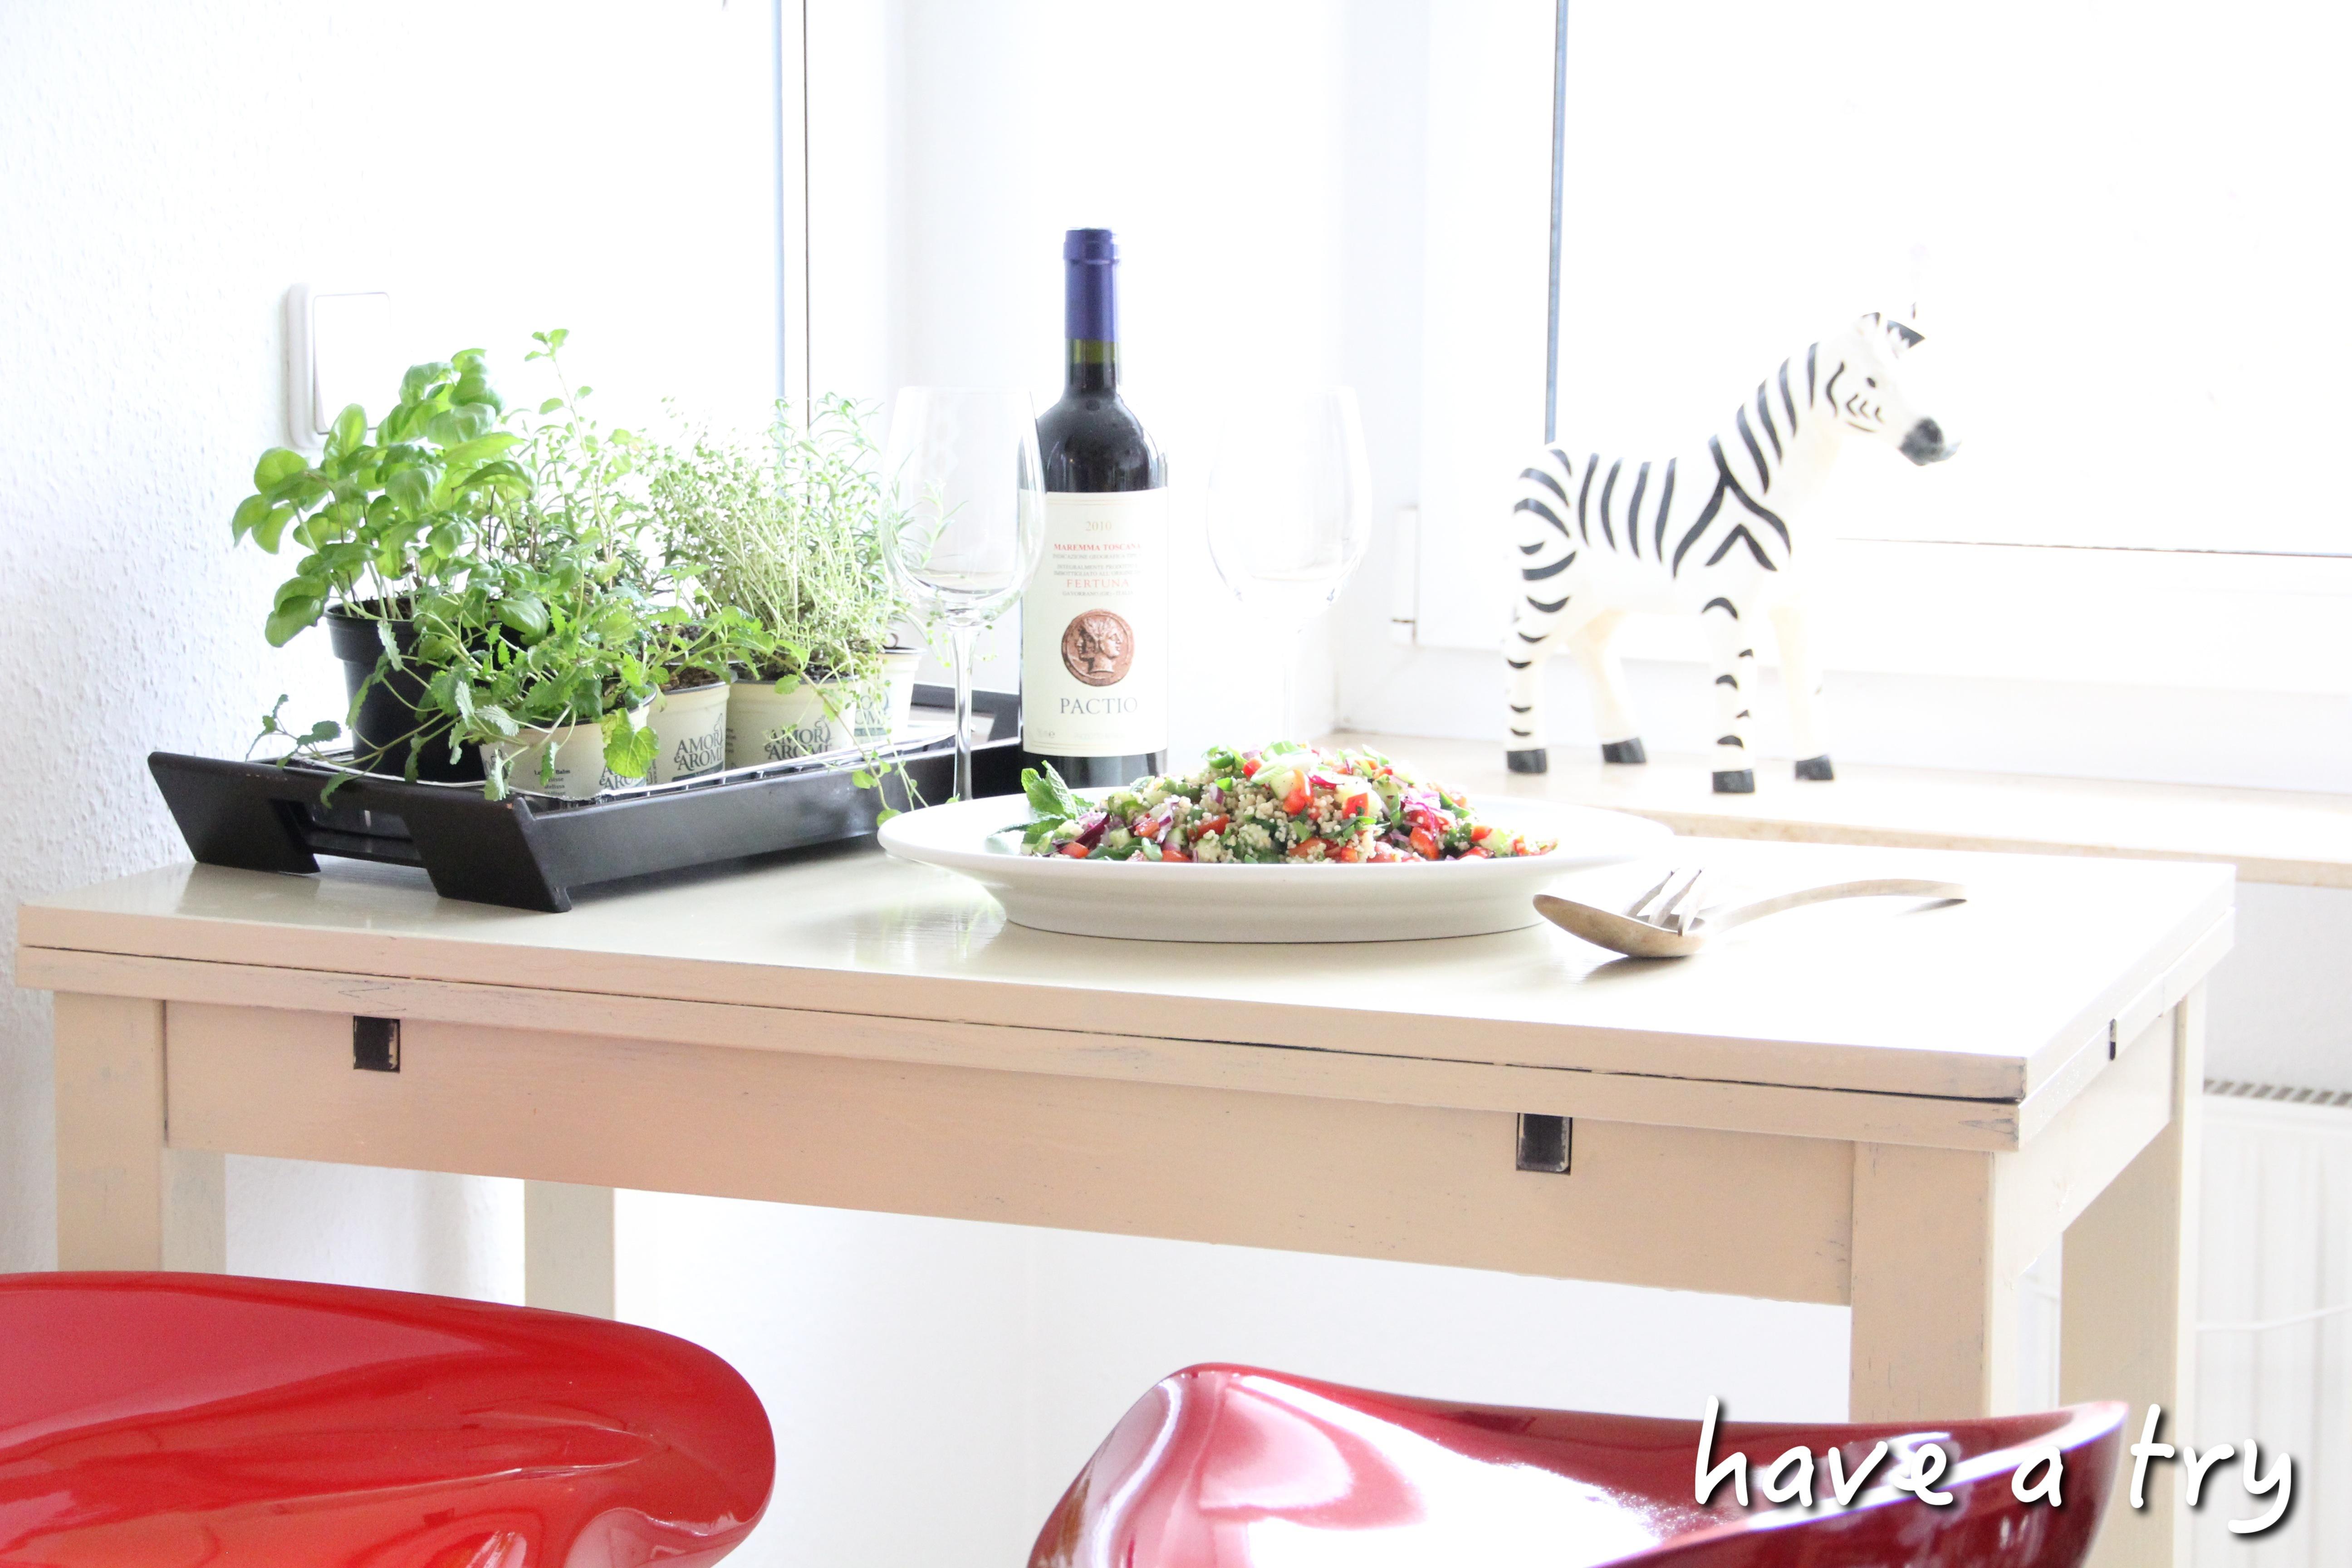 Couscous mit Minze und Petersilie (vegan)